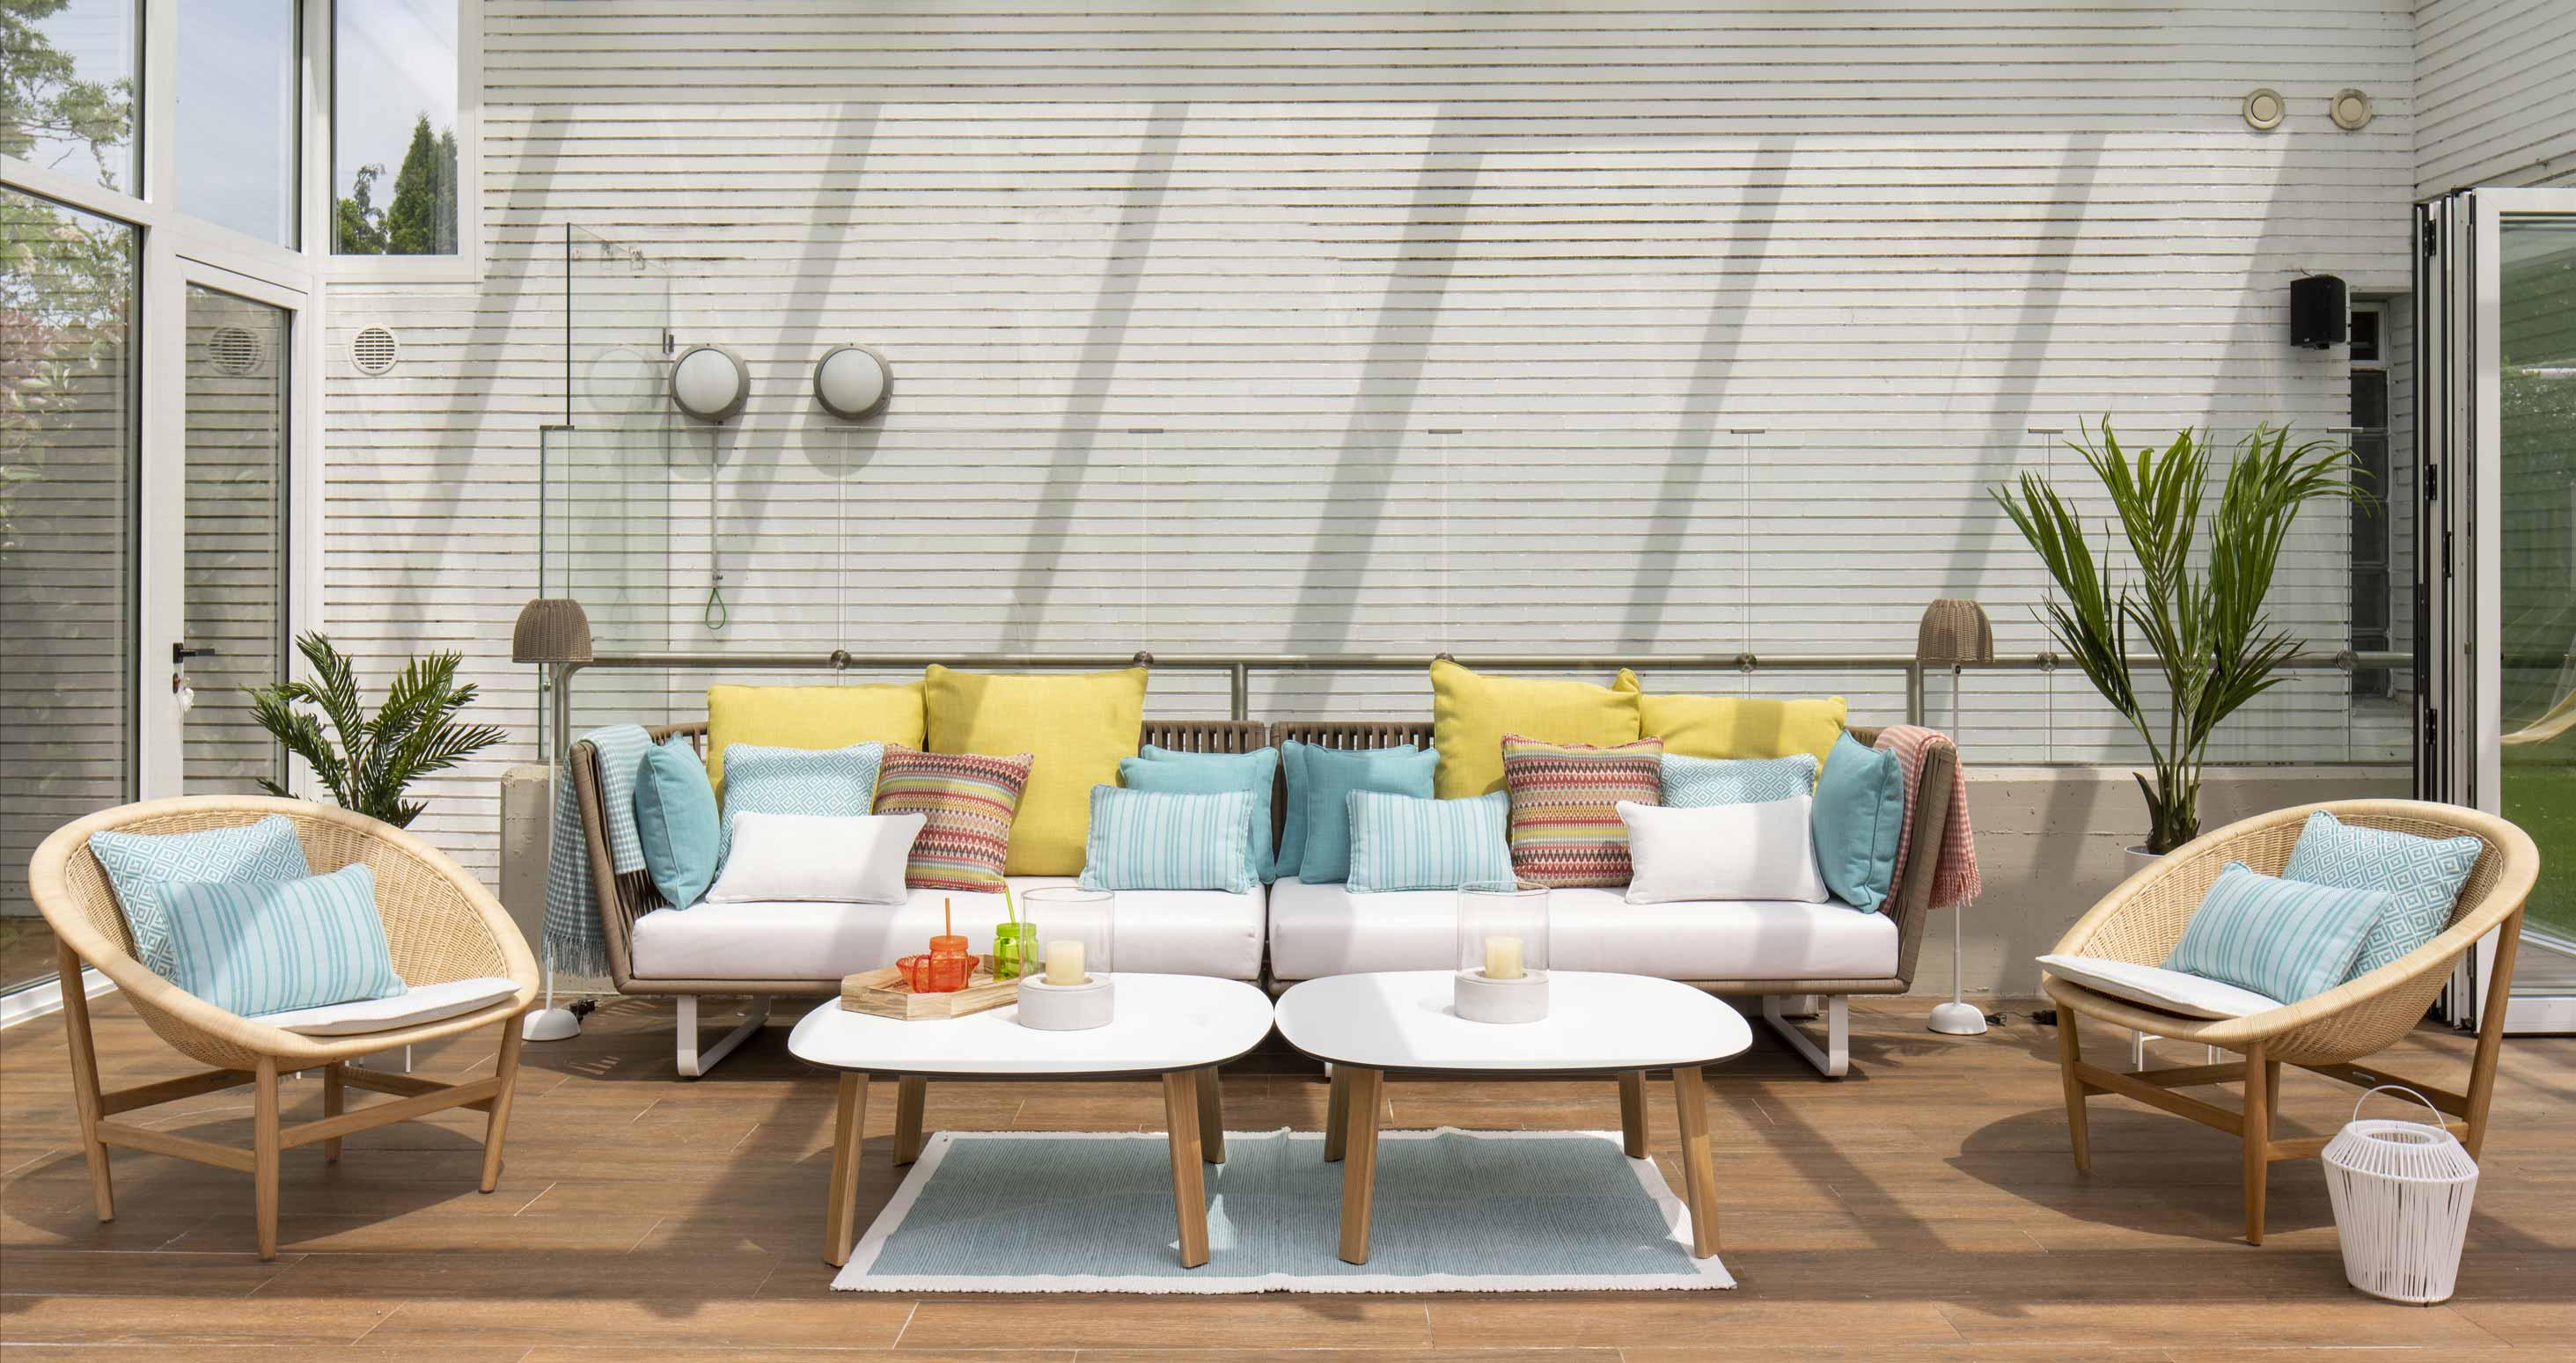 Diseño De Terrazas Cerradas De Cristal Sube Interiorismo